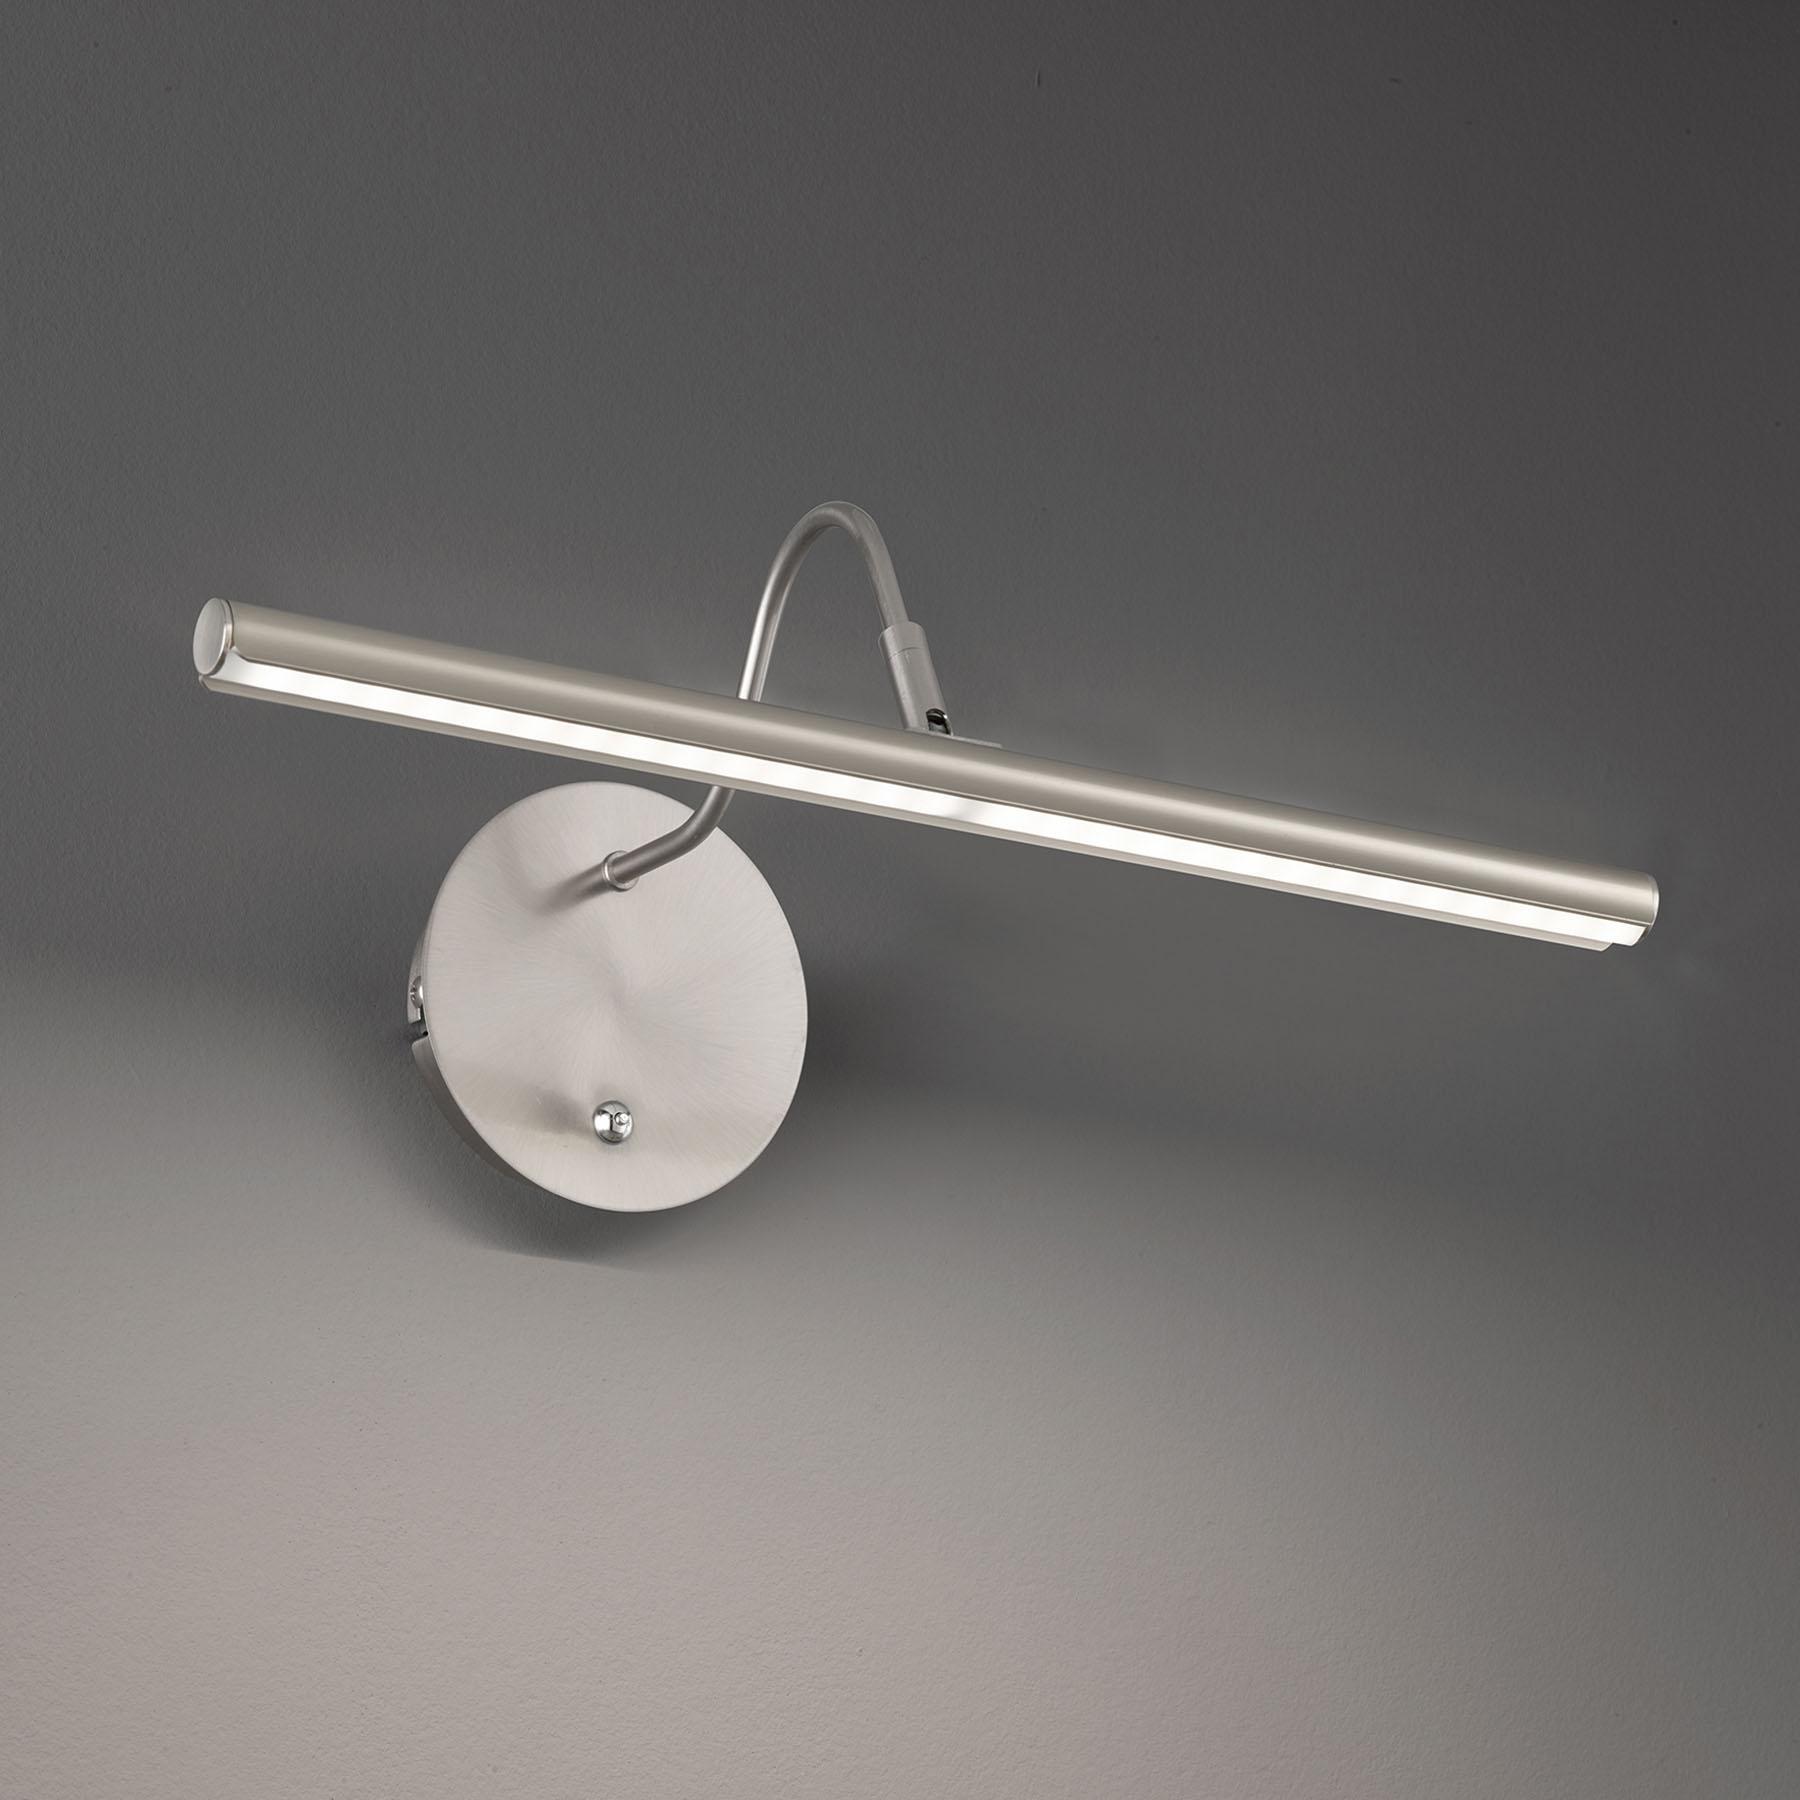 Applique LED Nami avec interrupteur, nickel